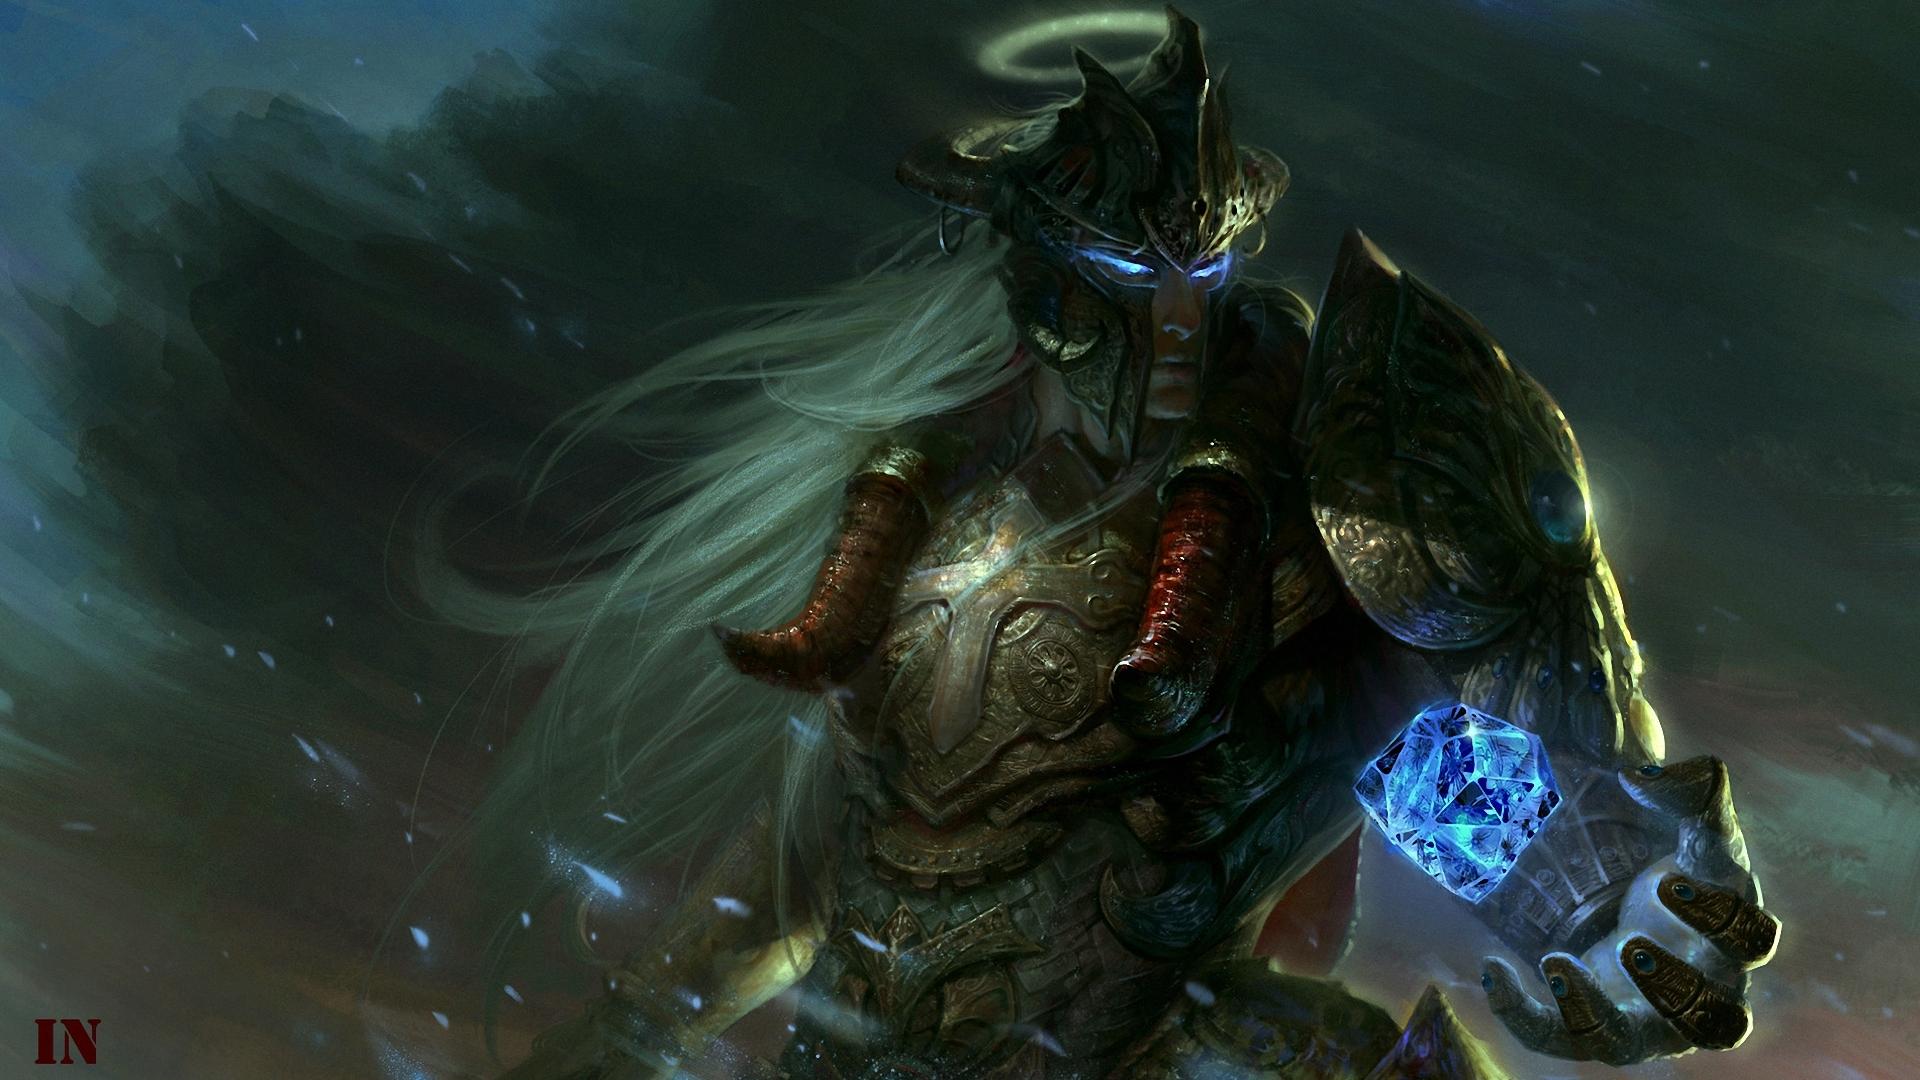 Download wallpaper crystal, magic, art, helmet, guy, armor ...